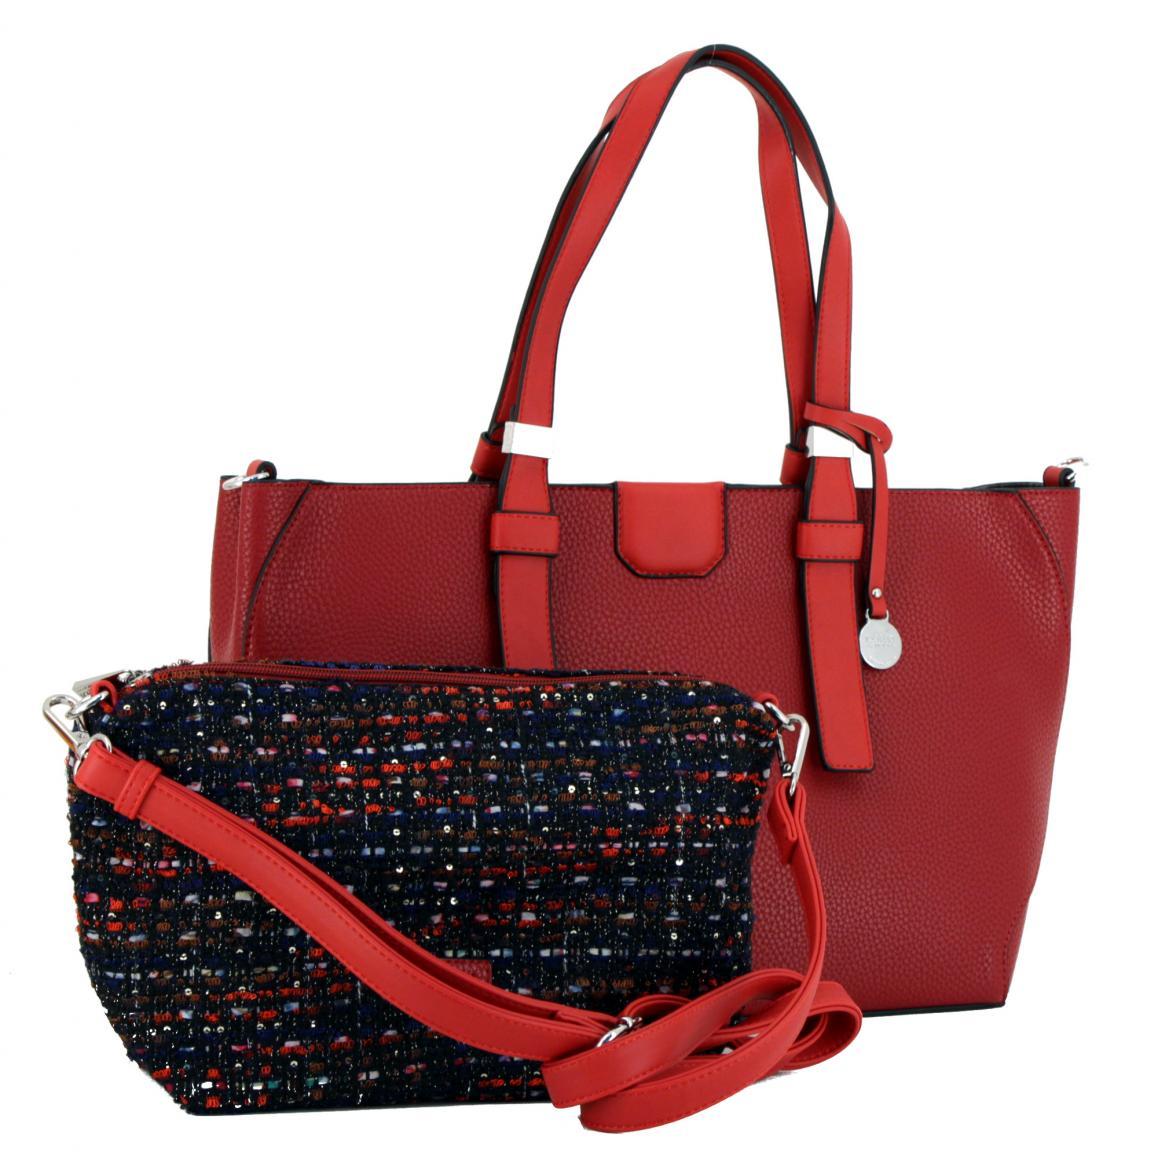 L.Credi Freundin-Collection Buena Shopper rot Boucle Anhäger